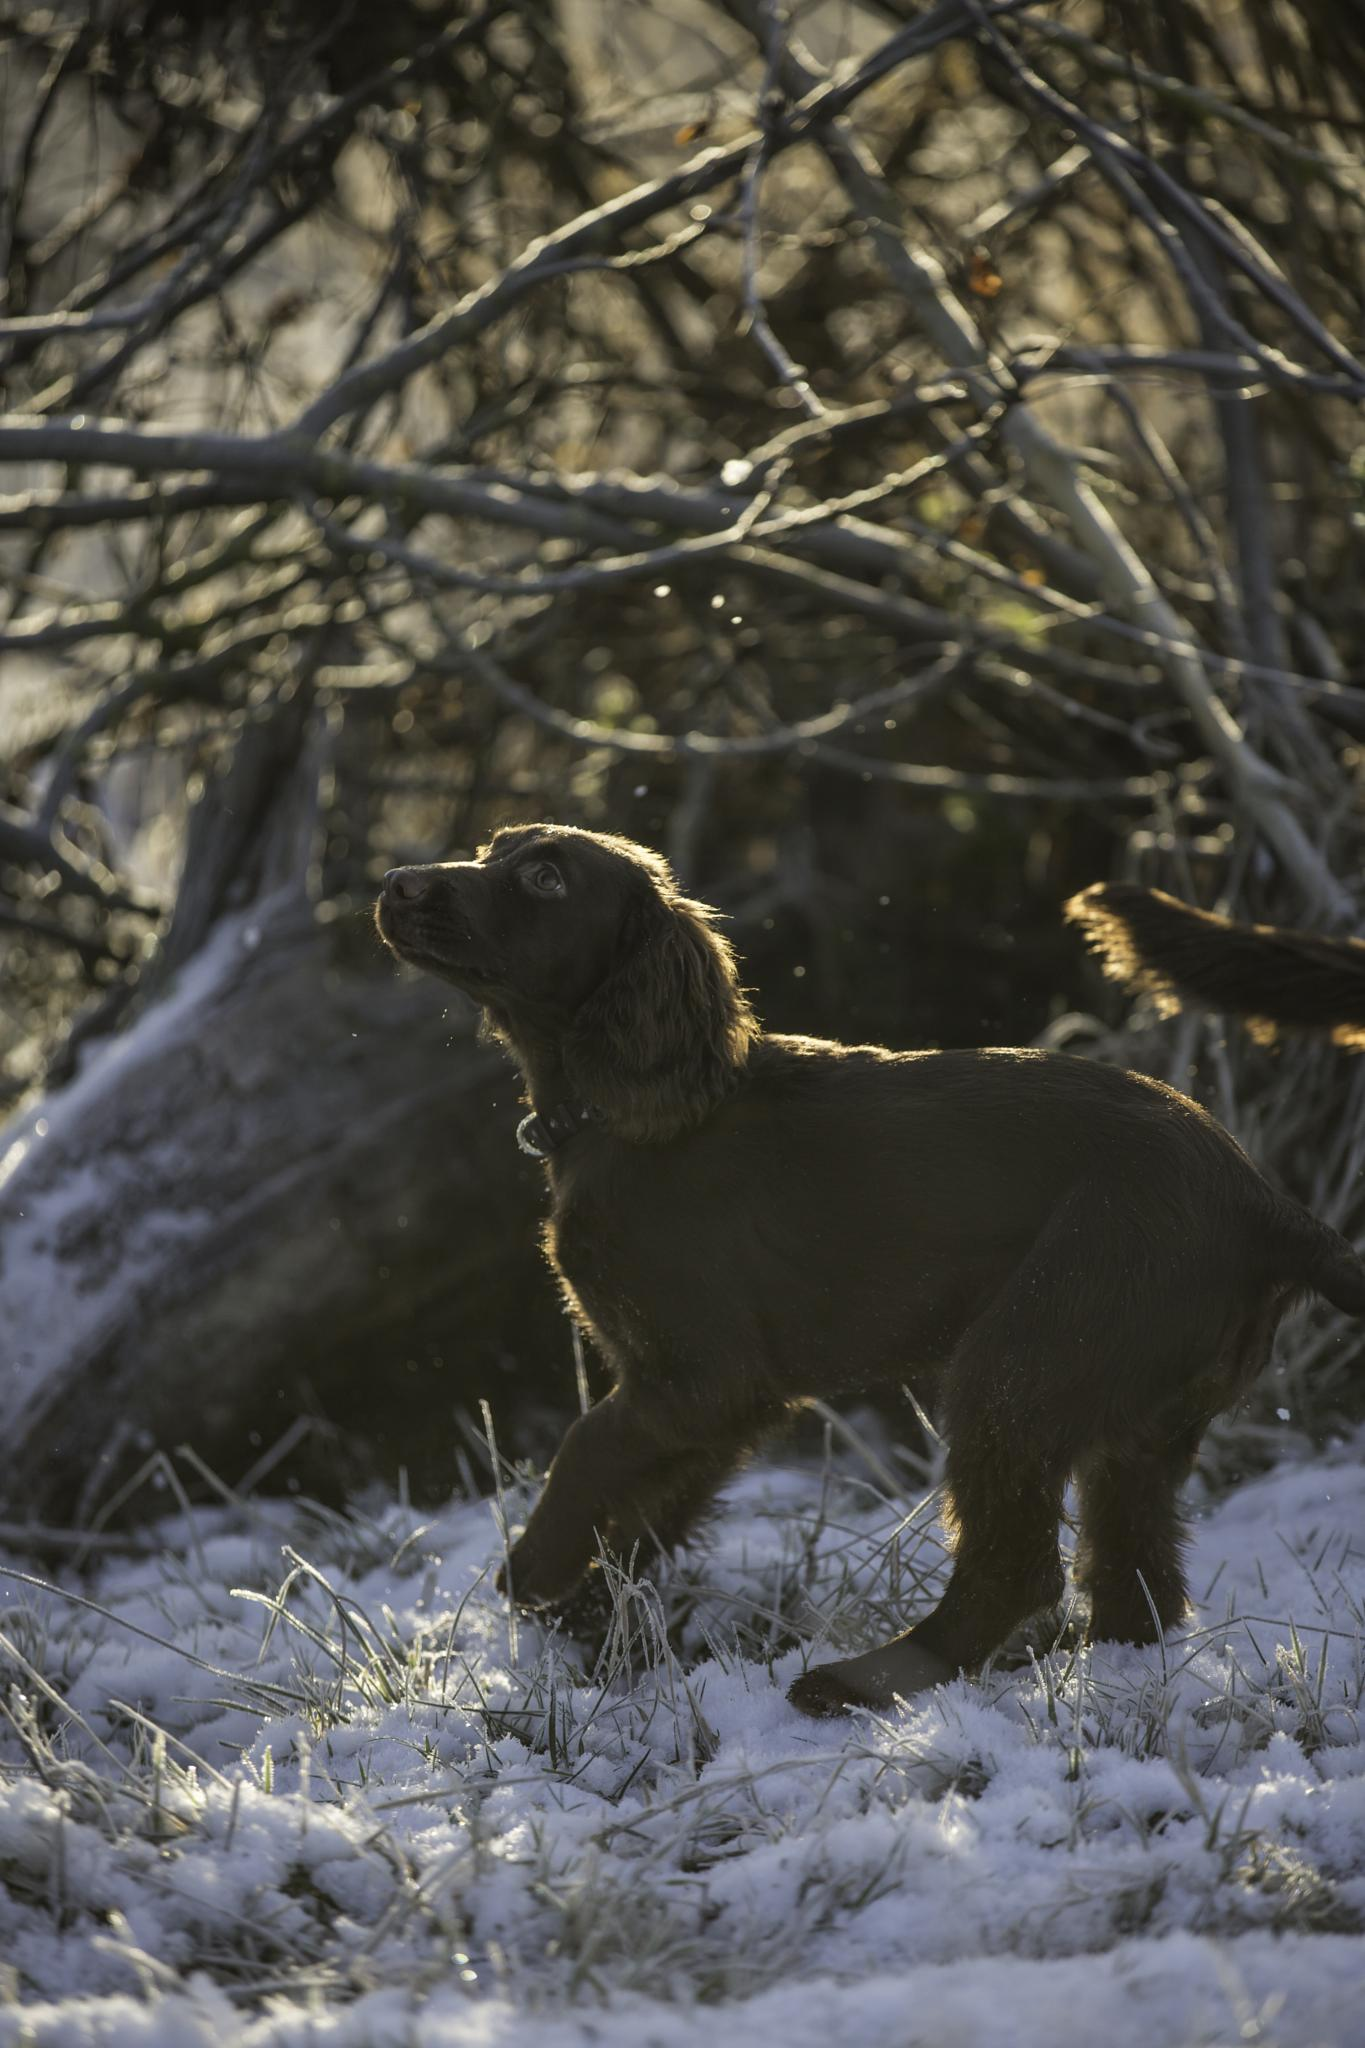 What Is Snow? by Gareth Sawbridge